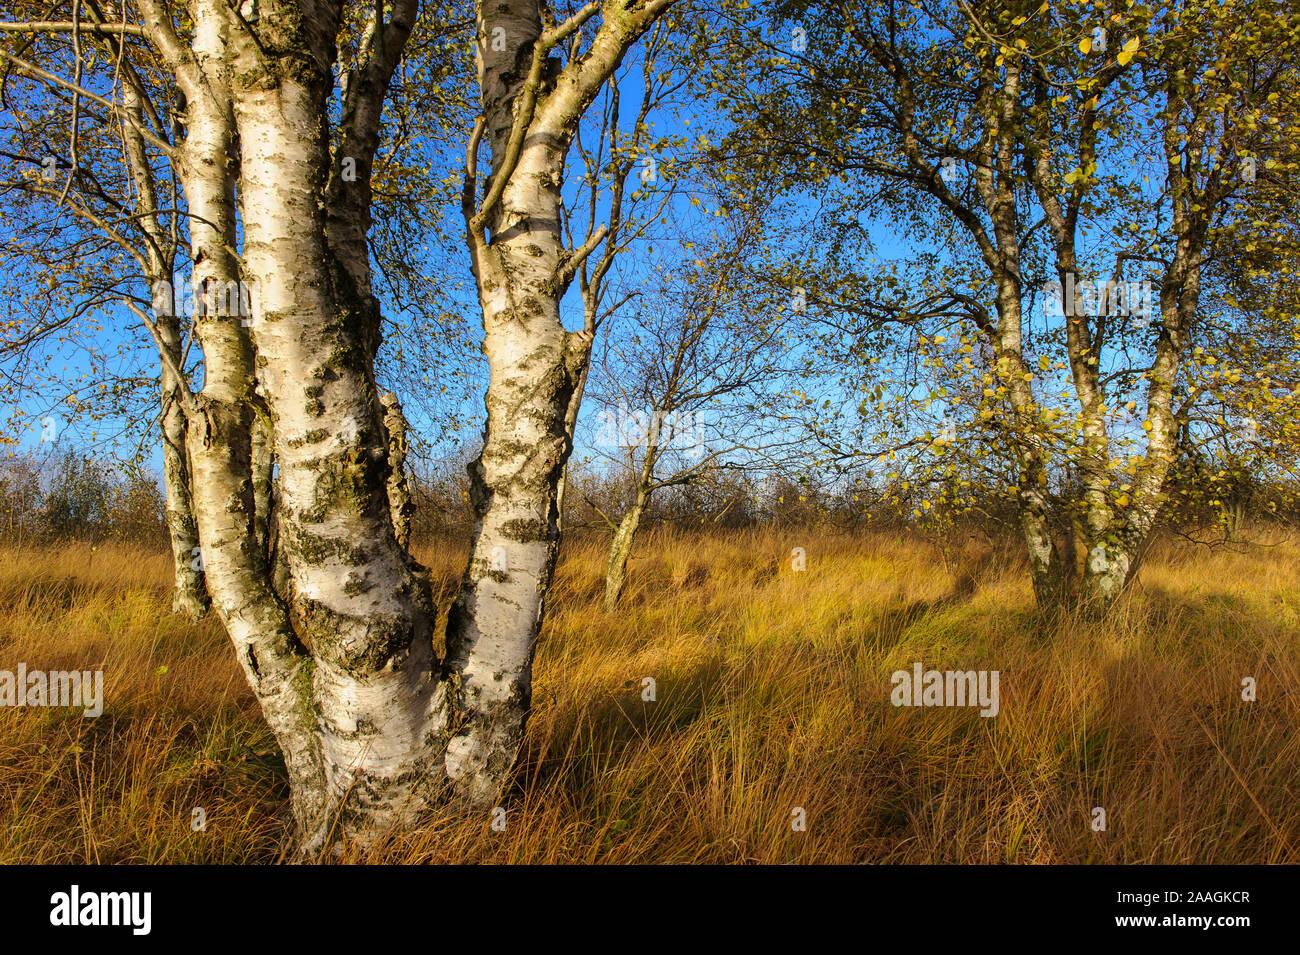 Herbstliche Birke im Moor Stock Photo